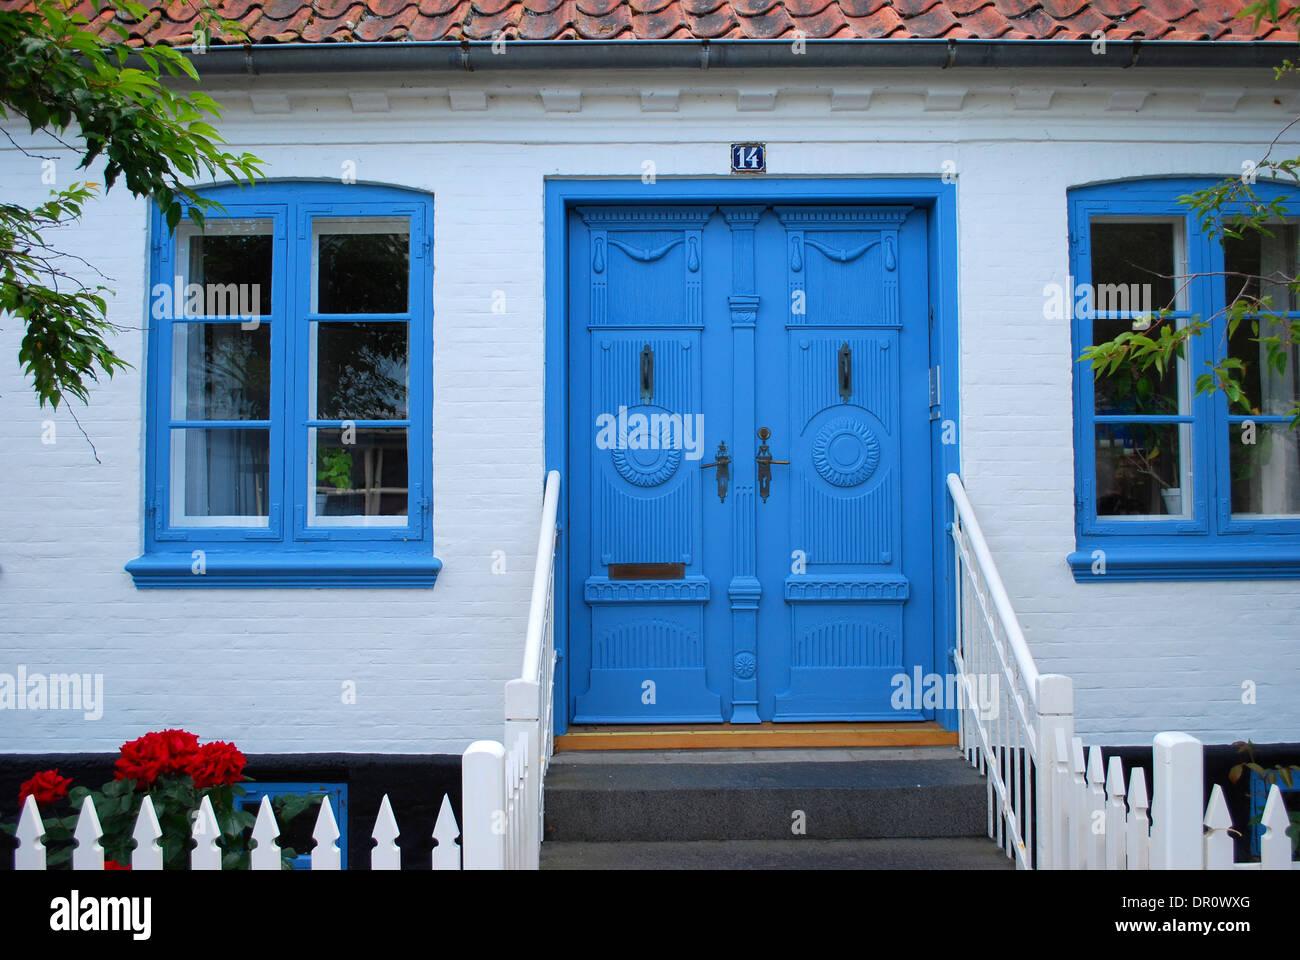 Aero island, old door at Marstal, fyn, Denmark, Scandinavia - Stock Image